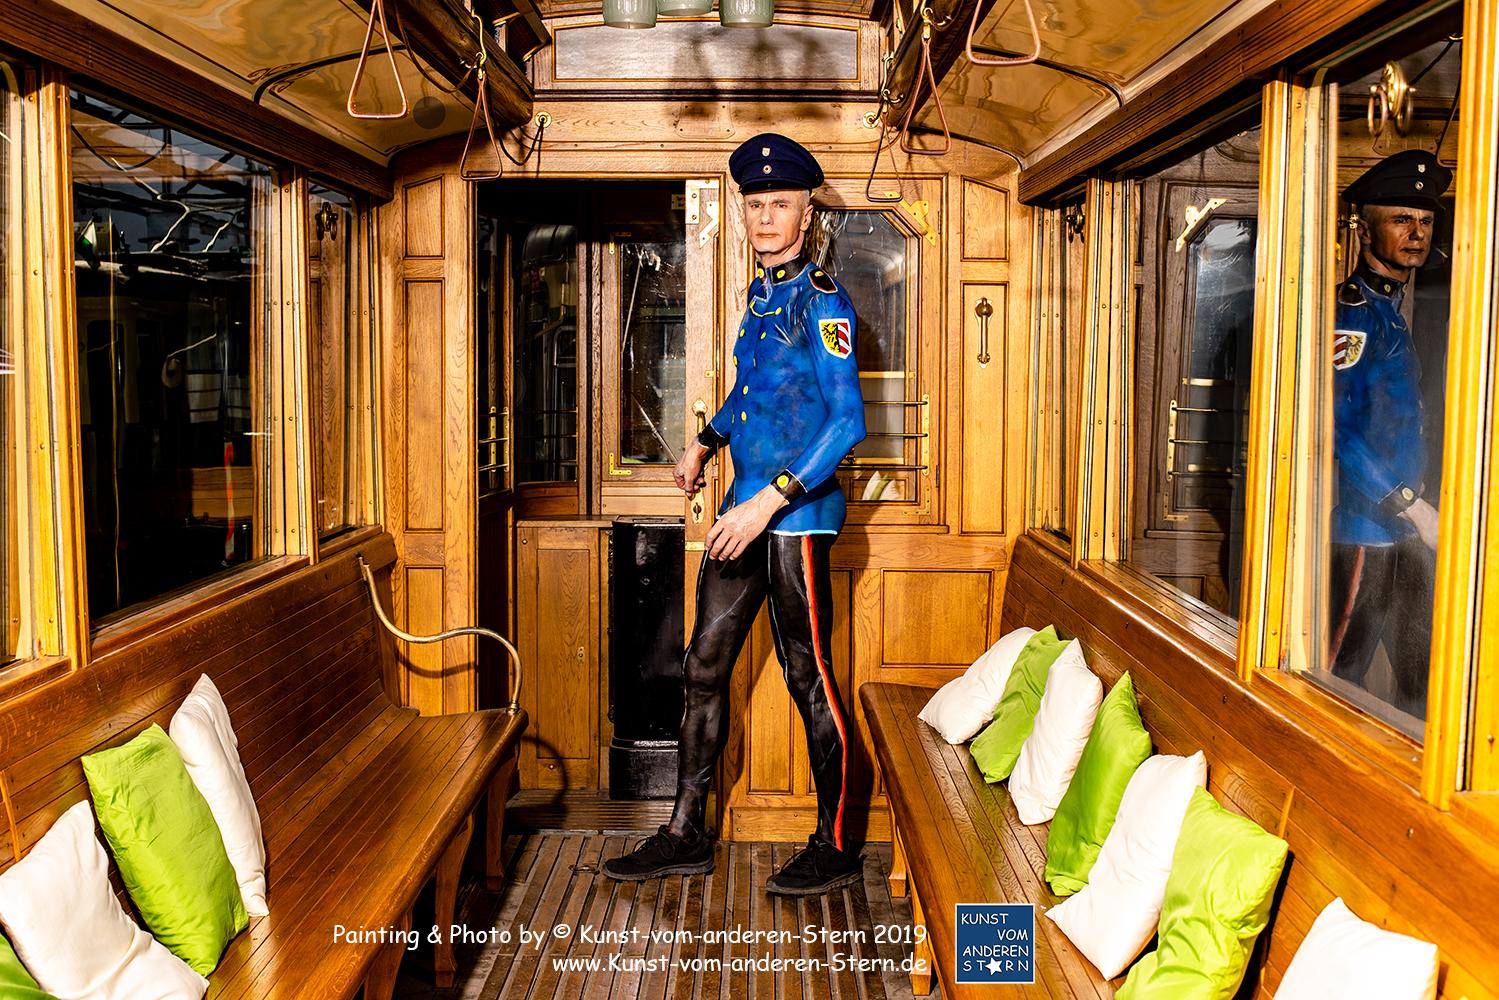 Bodypaintingprojekt Nürnberg – Live Bodypainting im historischen Straßenbahndepot St. Peters